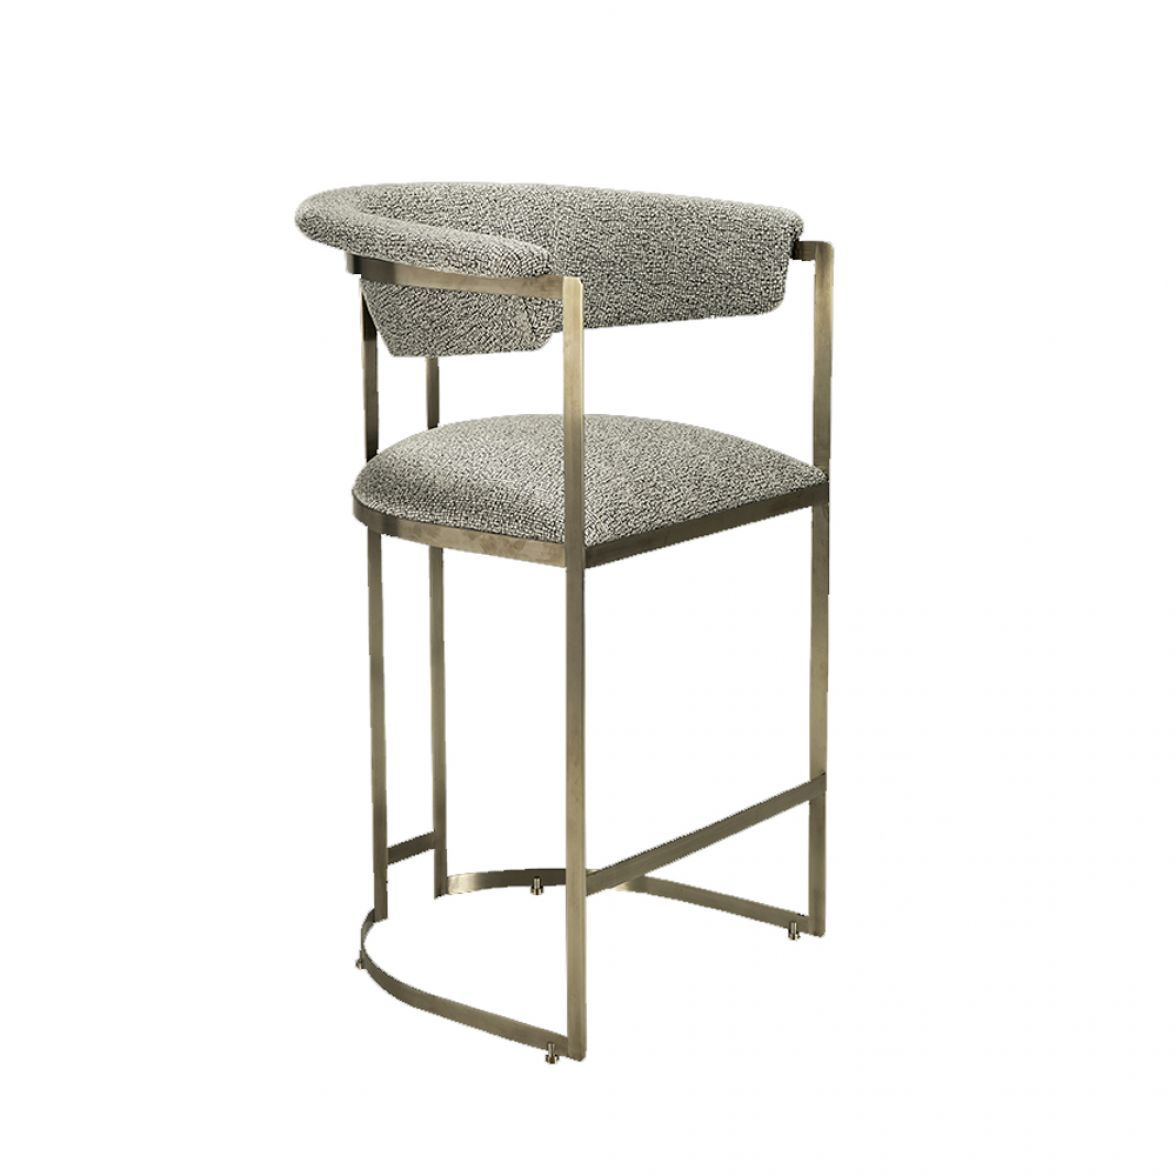 ANOUKA bar stool